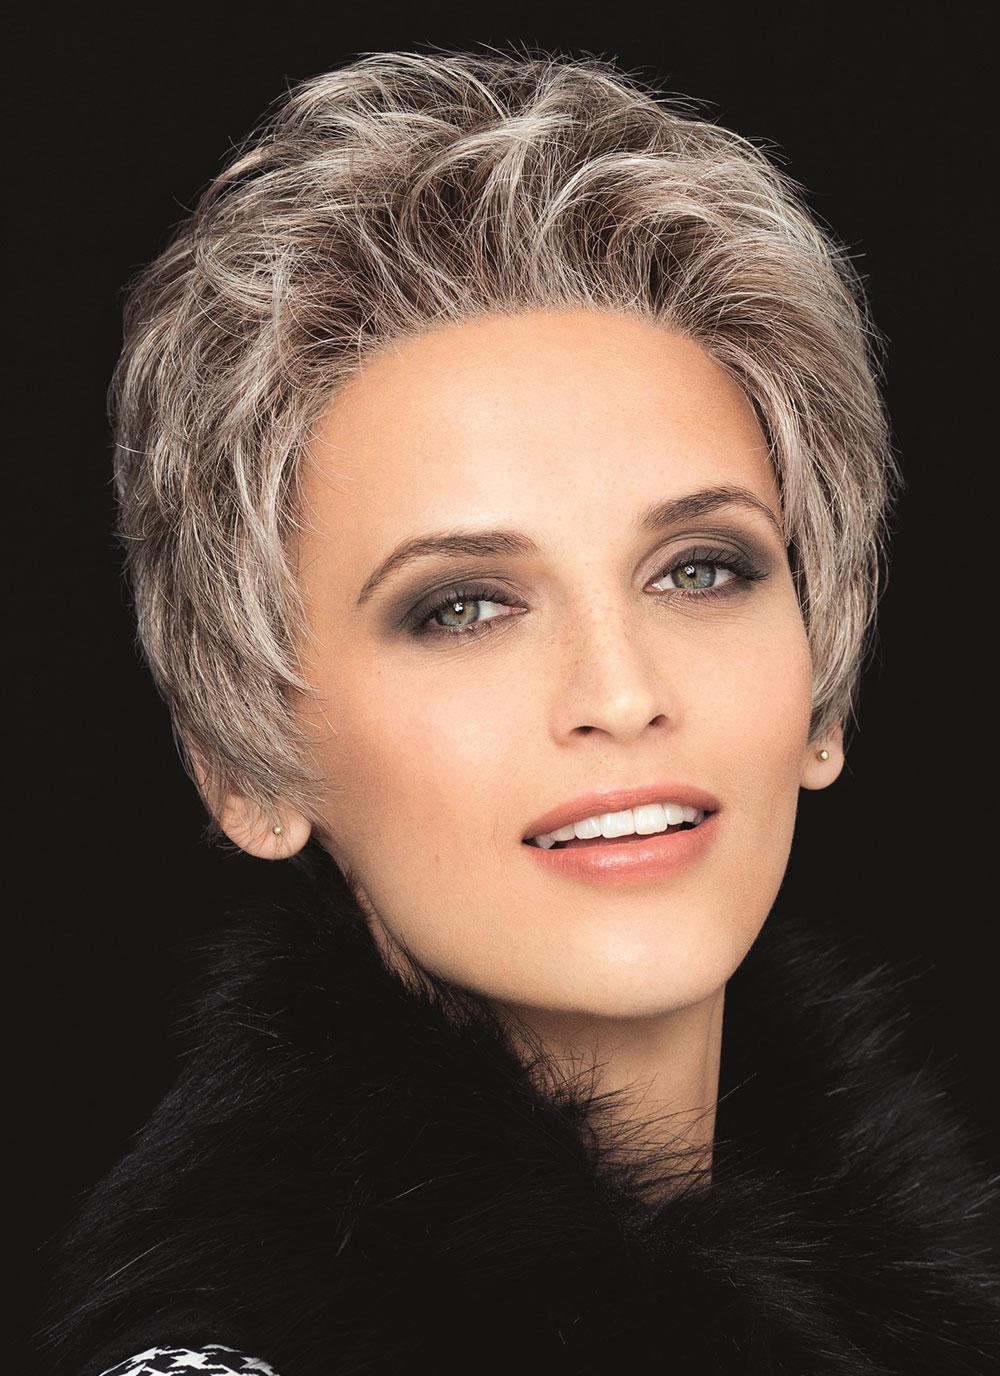 Gisela Mayer Perücke: Visconti Gold Star